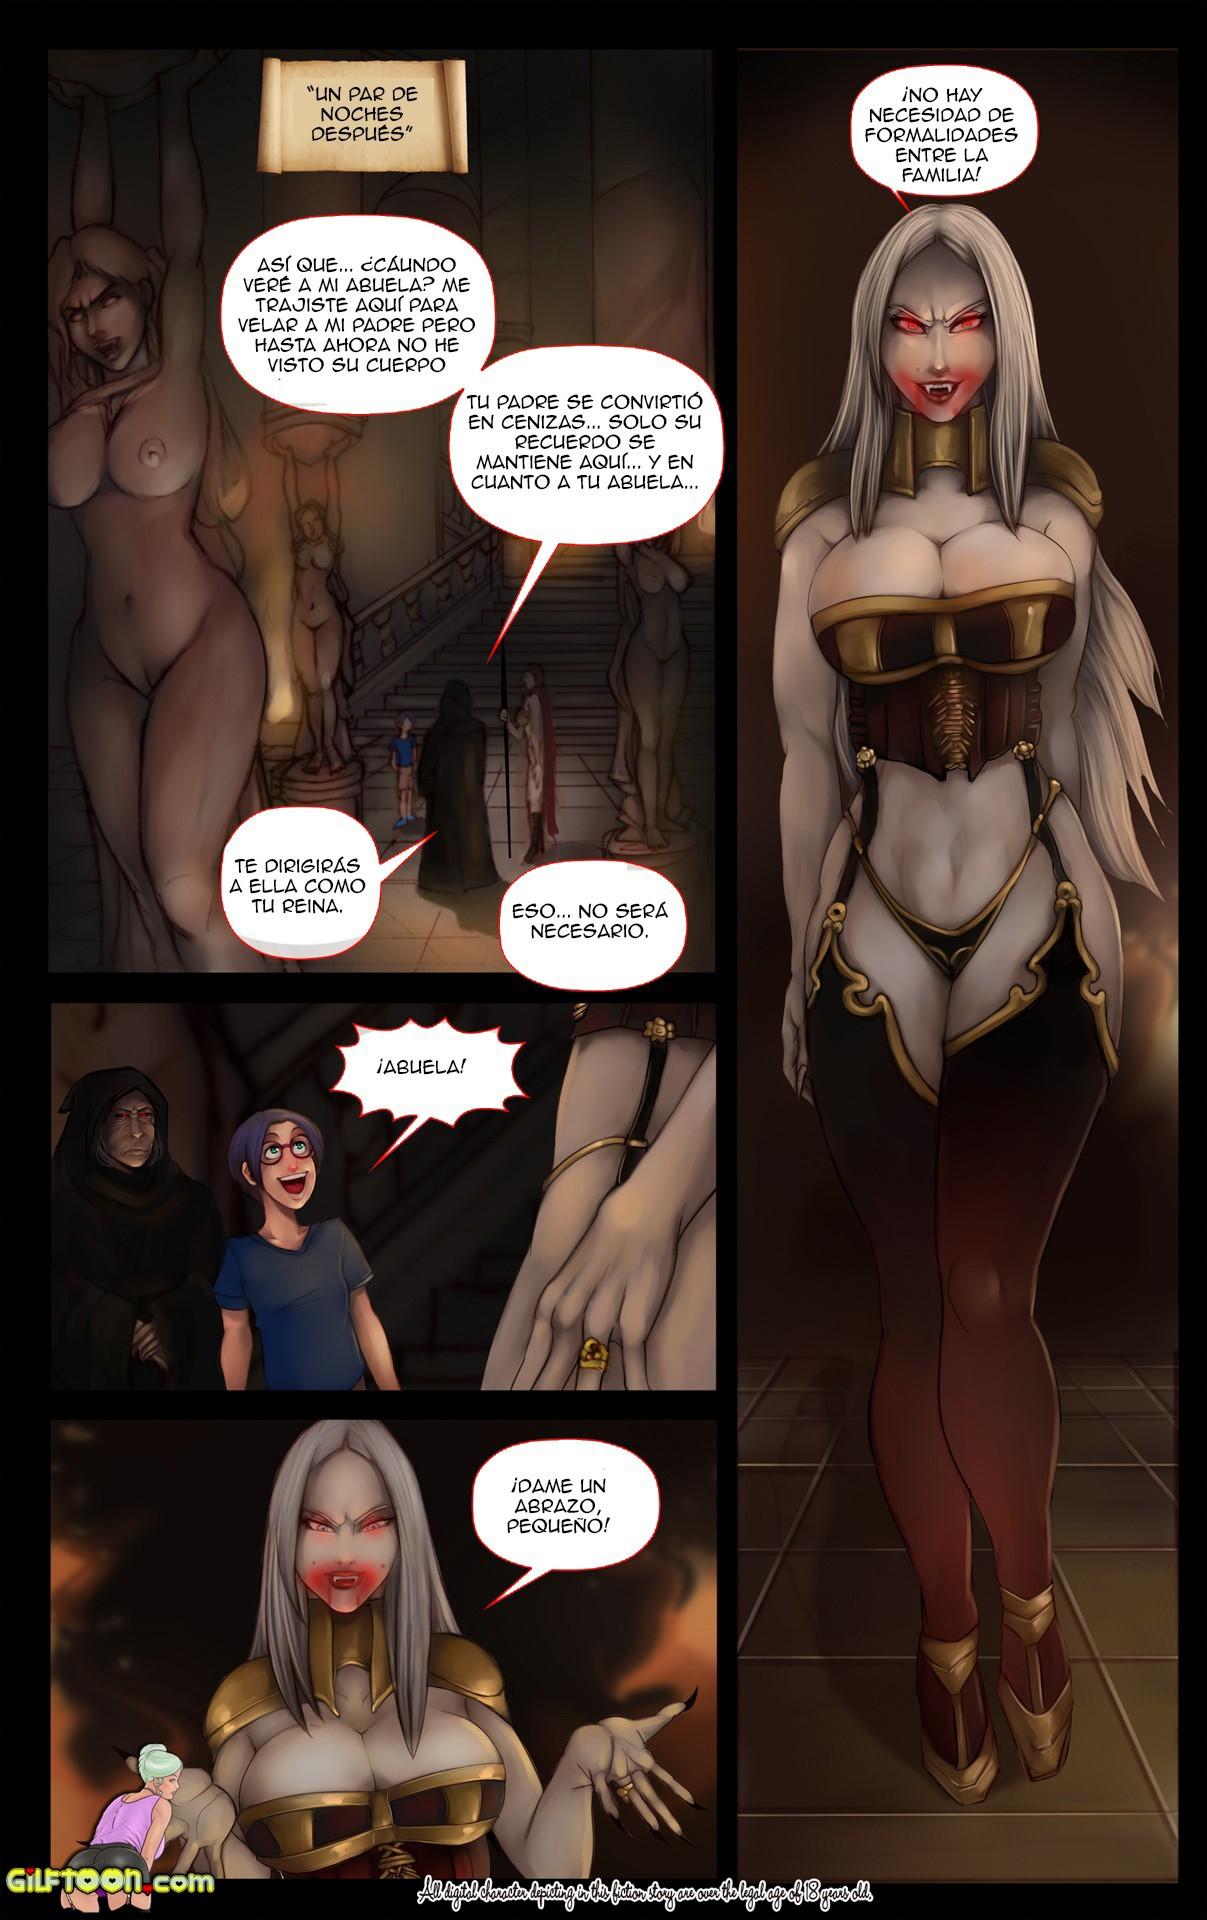 Vampires-Grandson-Gilftoon-05.jpg comic porno